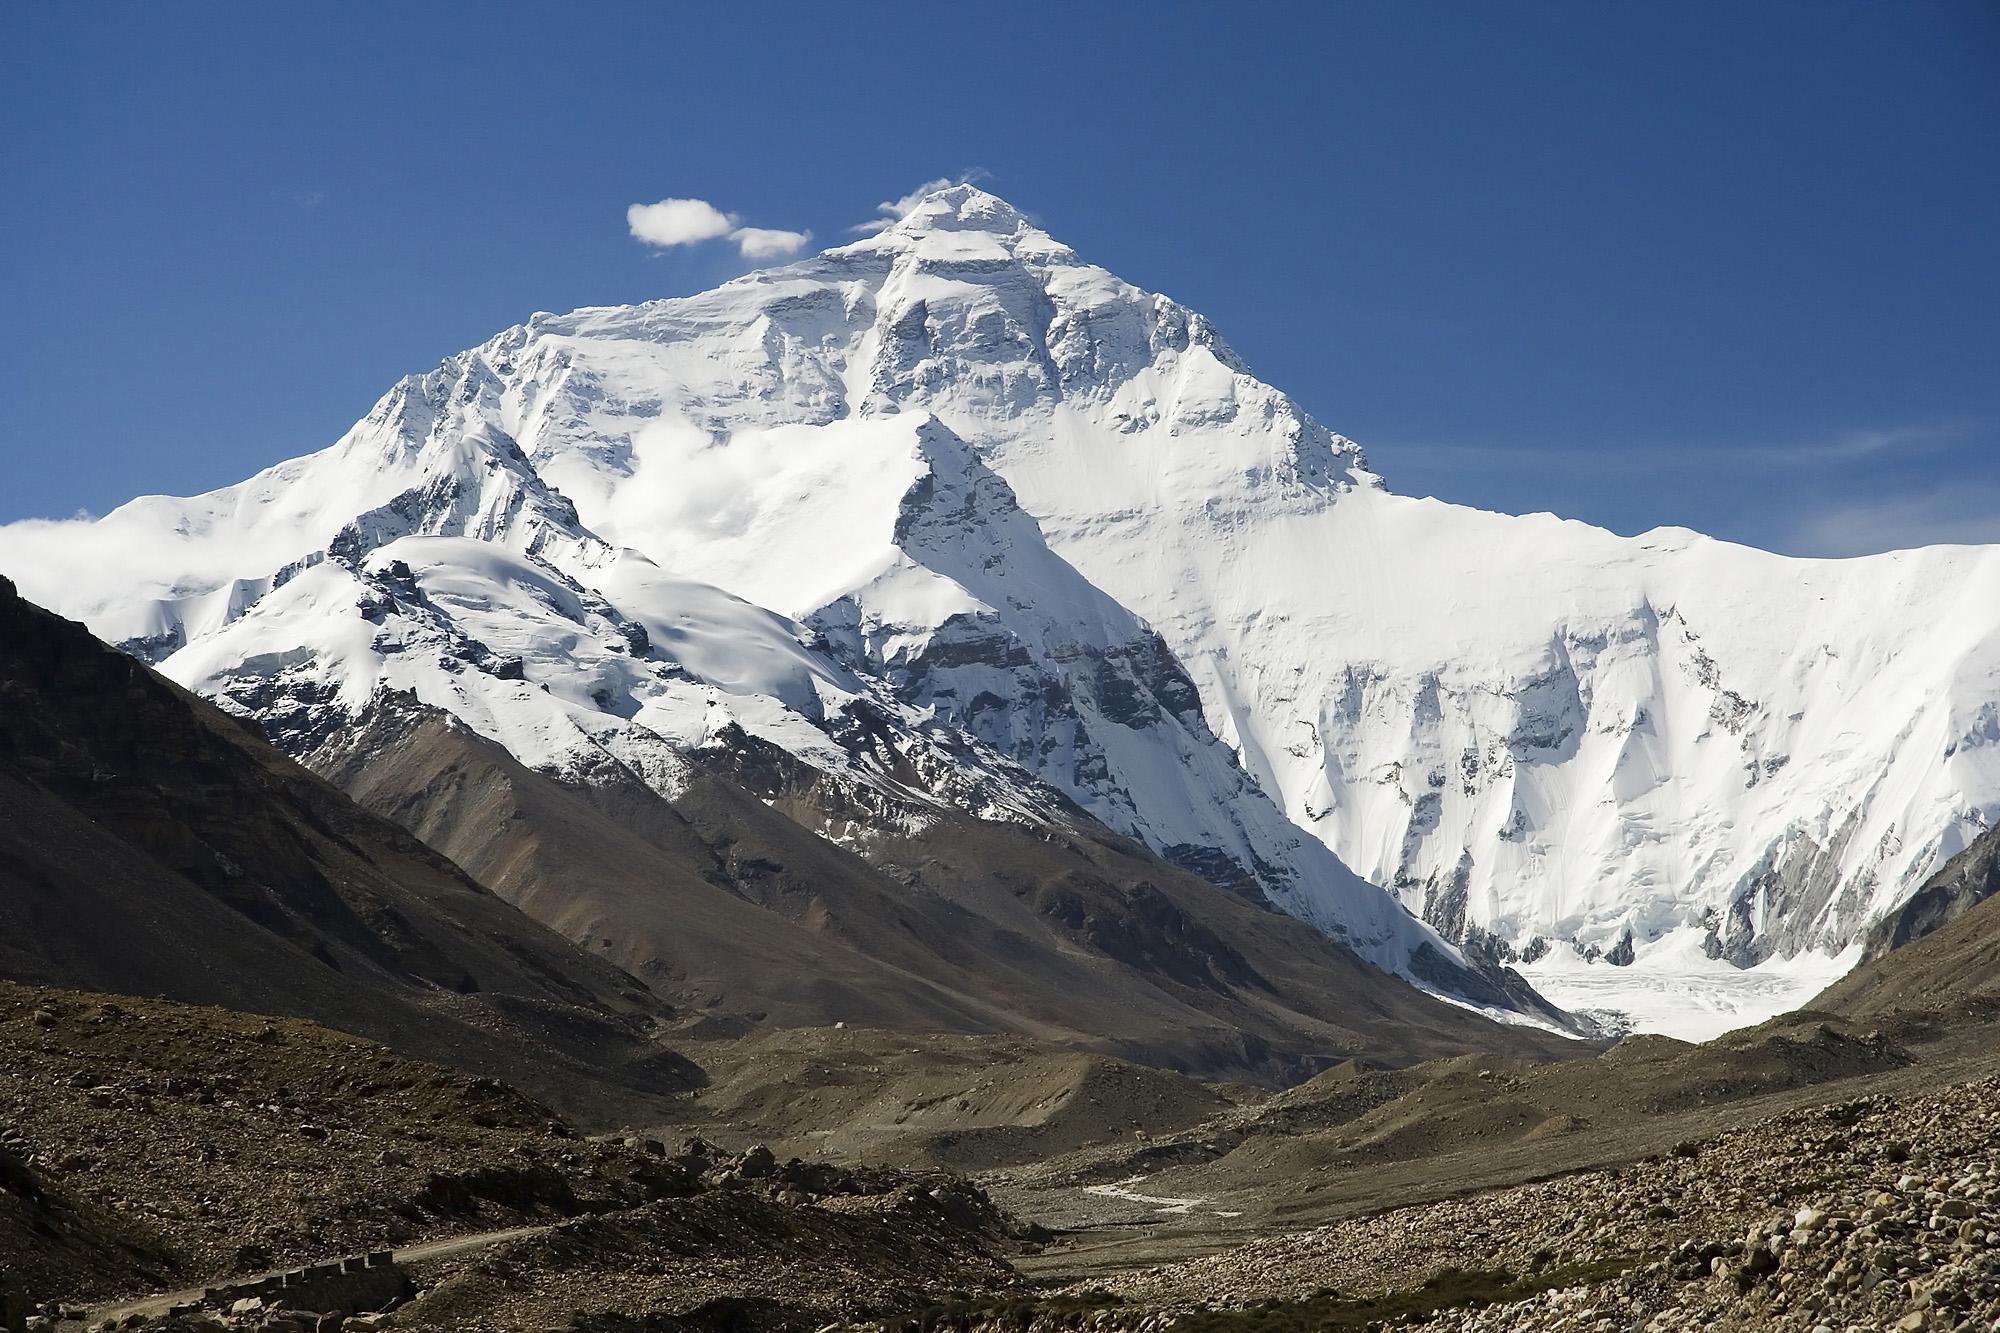 FltGraph Awesome Itinerary 18. 걷는 것이 보약이다, 네팔 트래킹 여행